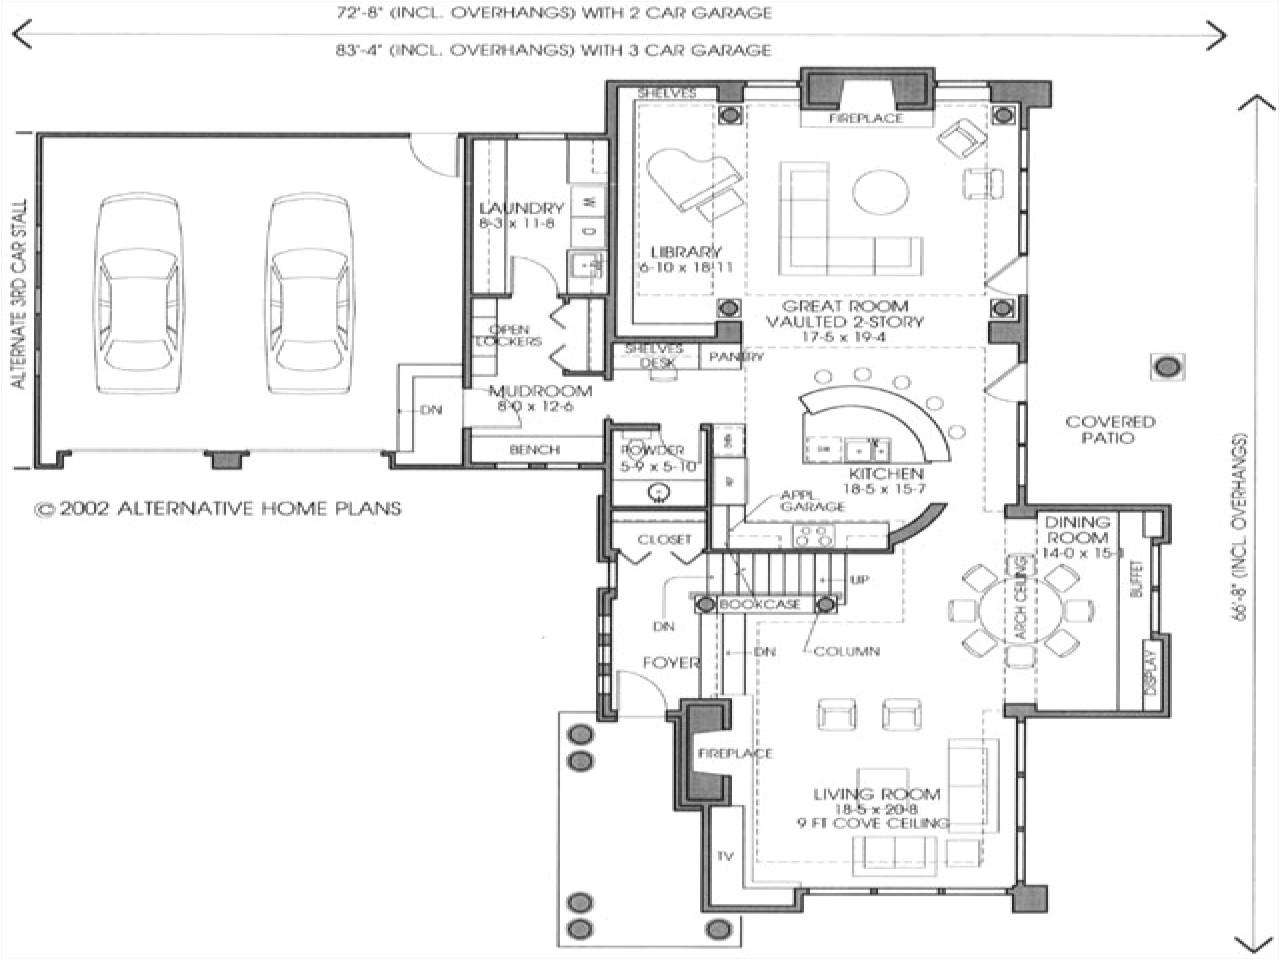 489c77c43c6301c5 slab on grade construction slab on grade home floor plans